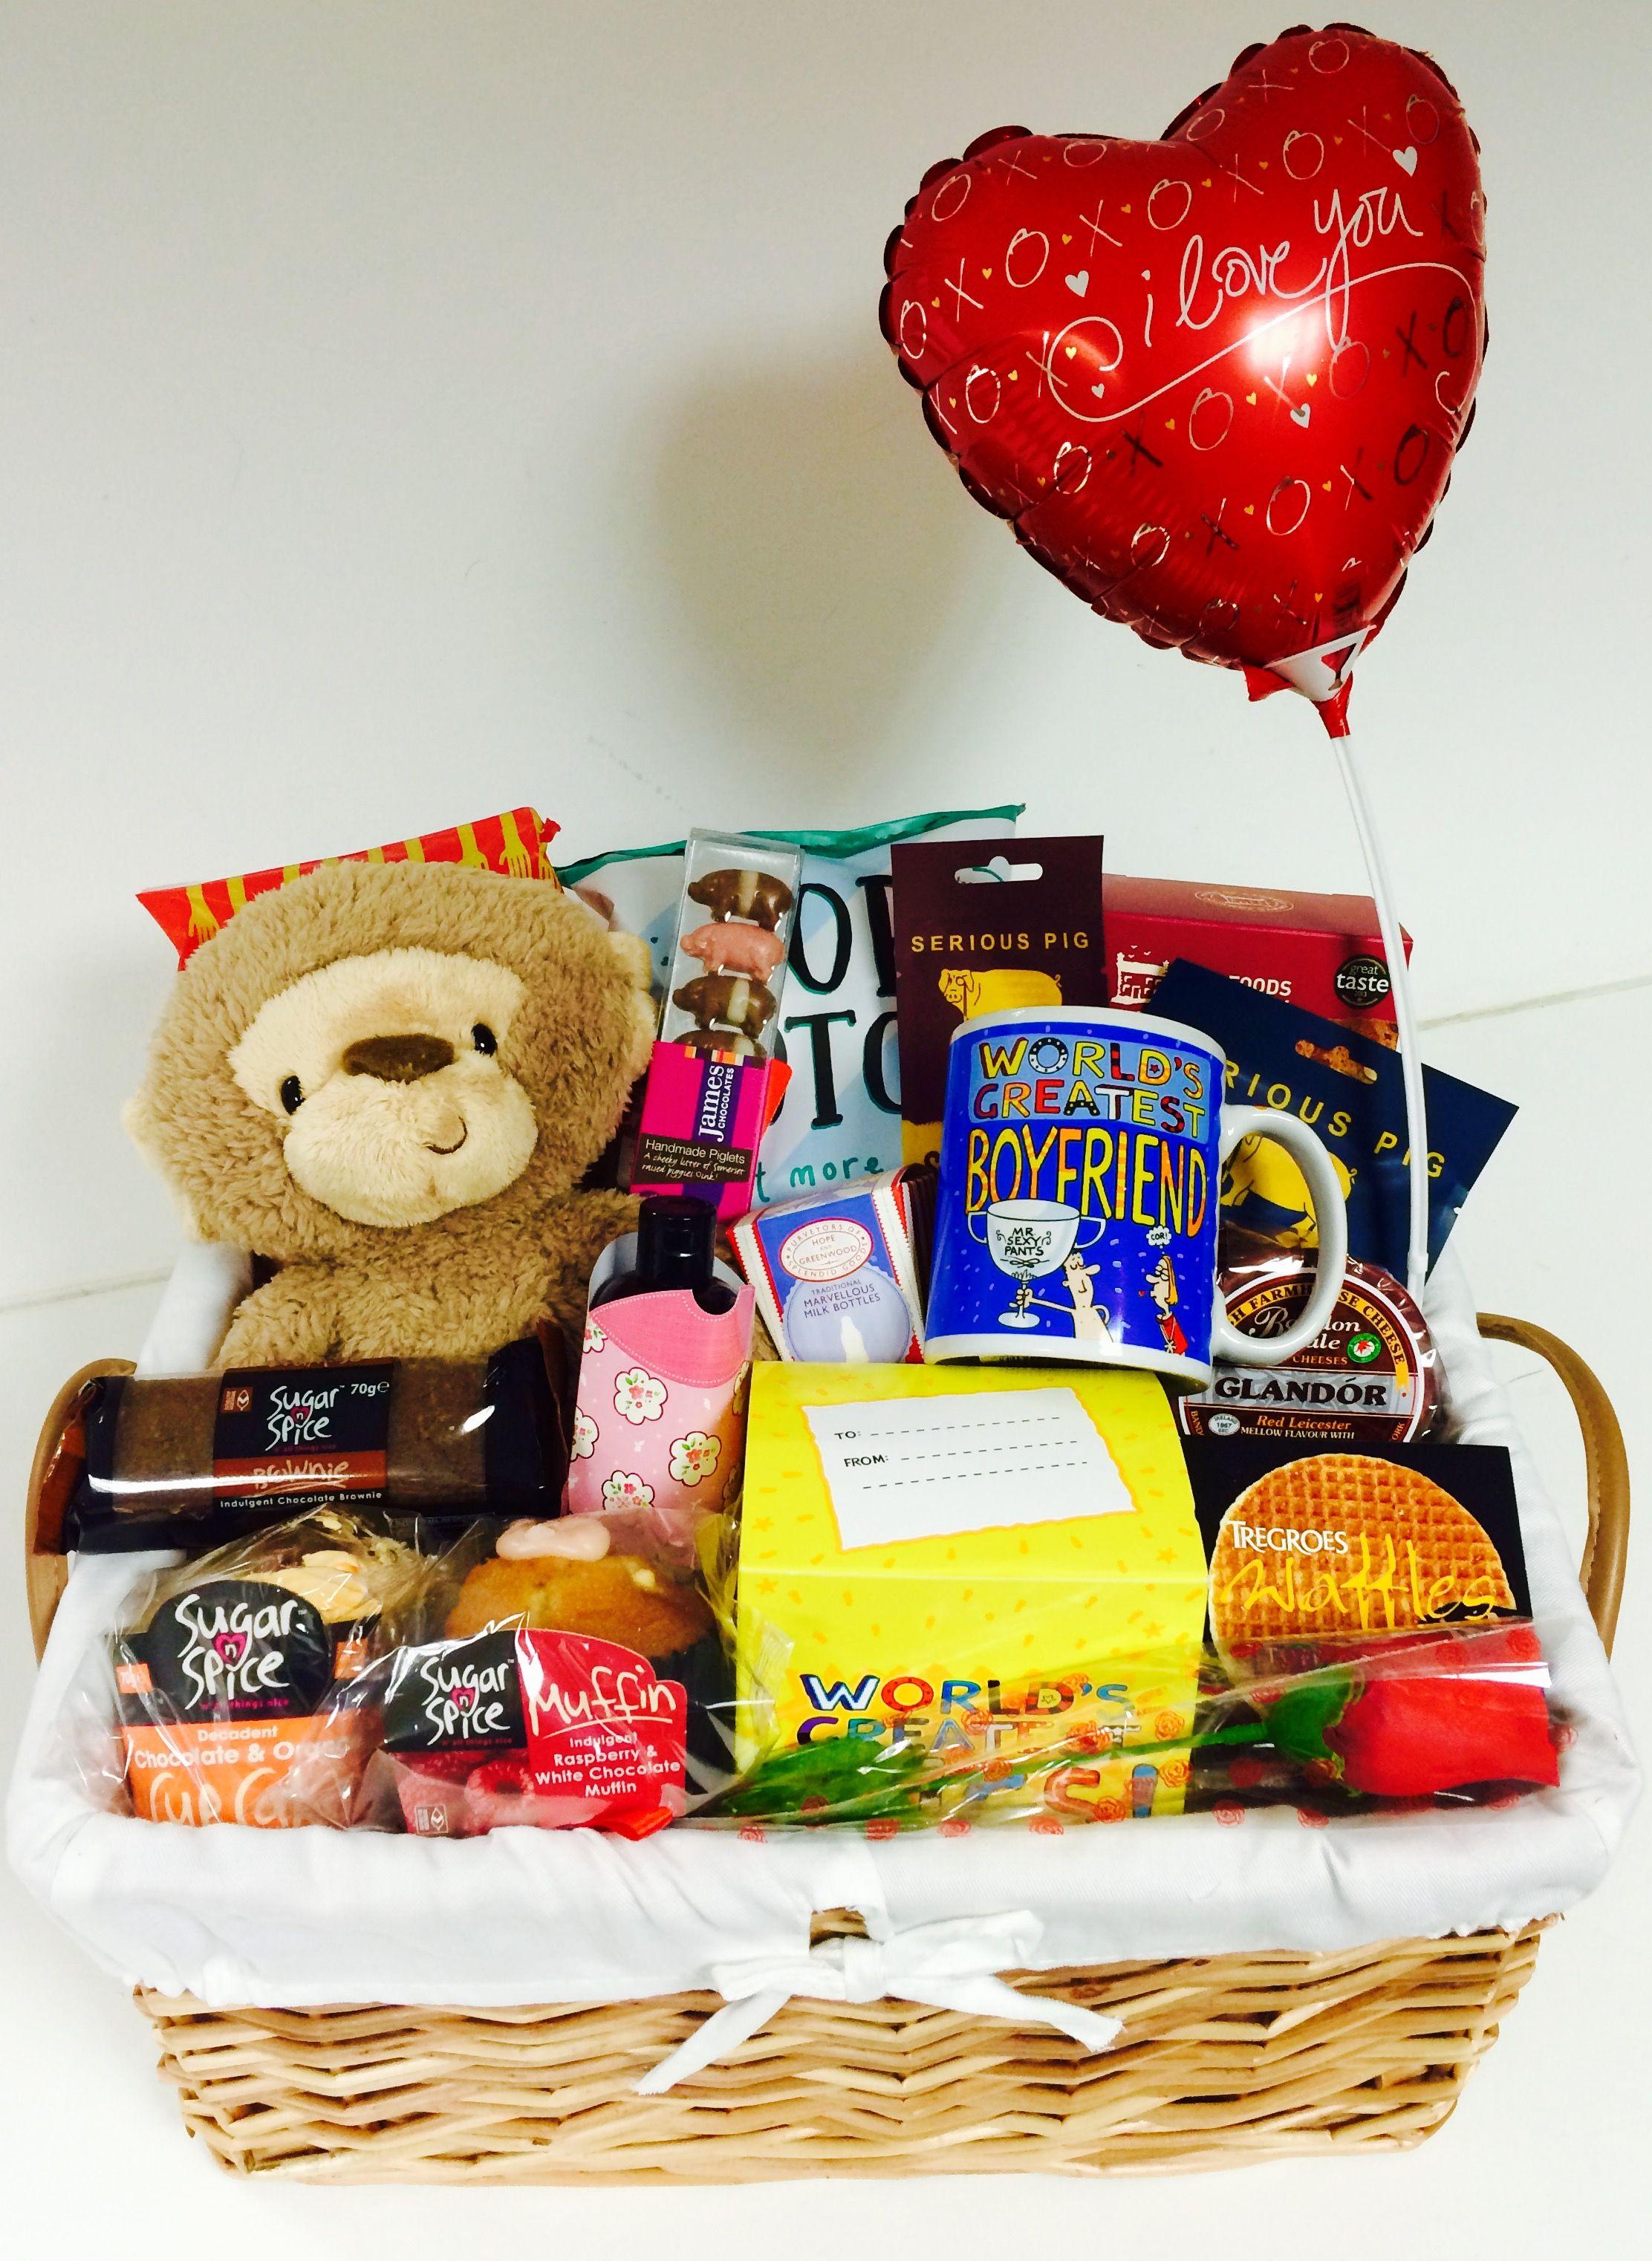 No 1 Boyfriend gift basket perfect for Valentine's Day, an